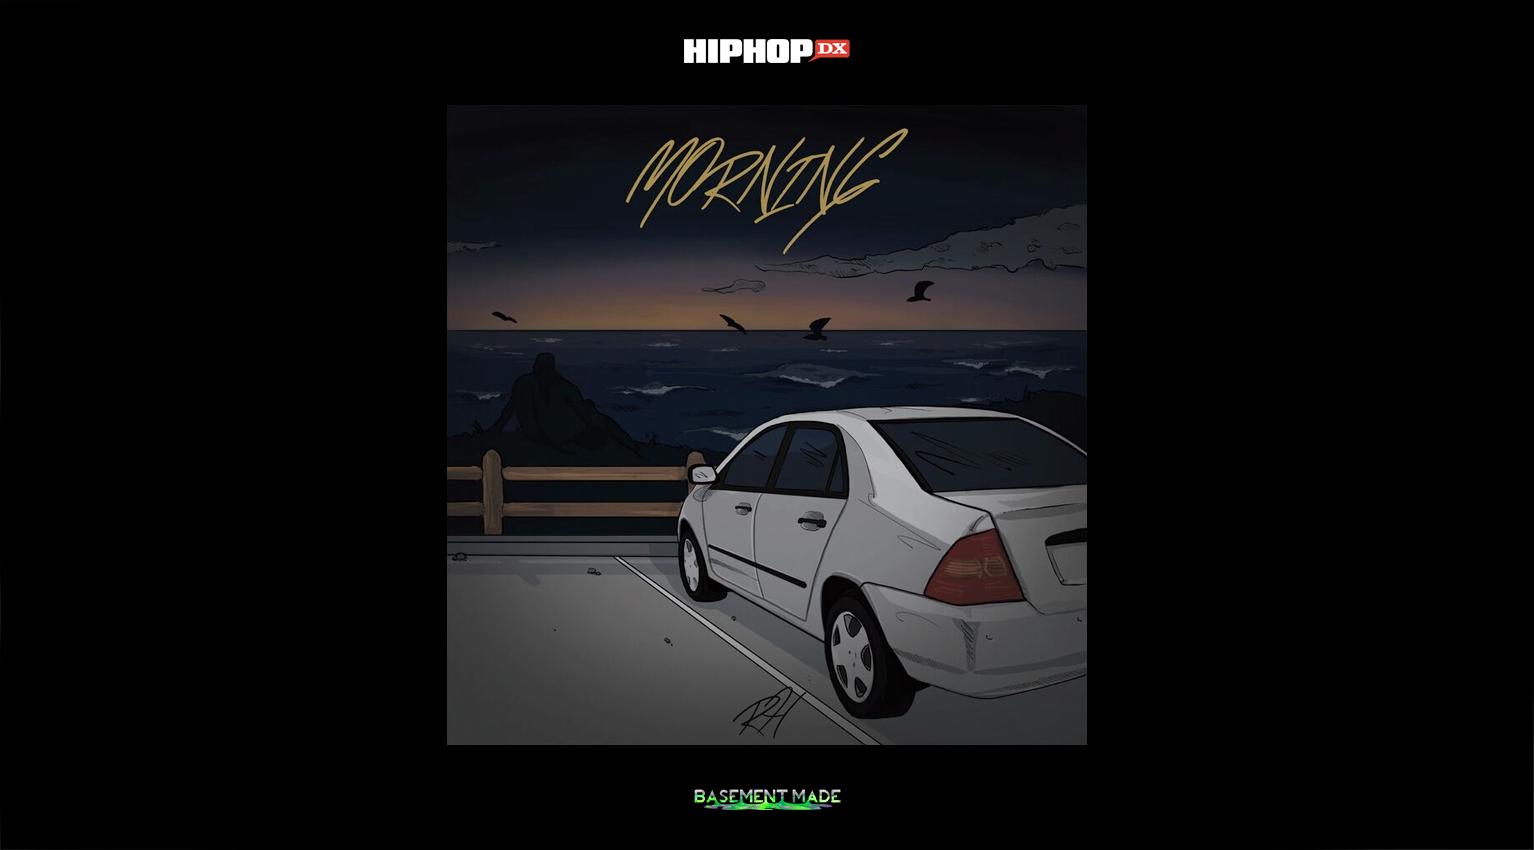 Rahn-Harper-Morning-premiere-ft.-Mic-Kellogg-cover-art-basement-made-hiphopdx